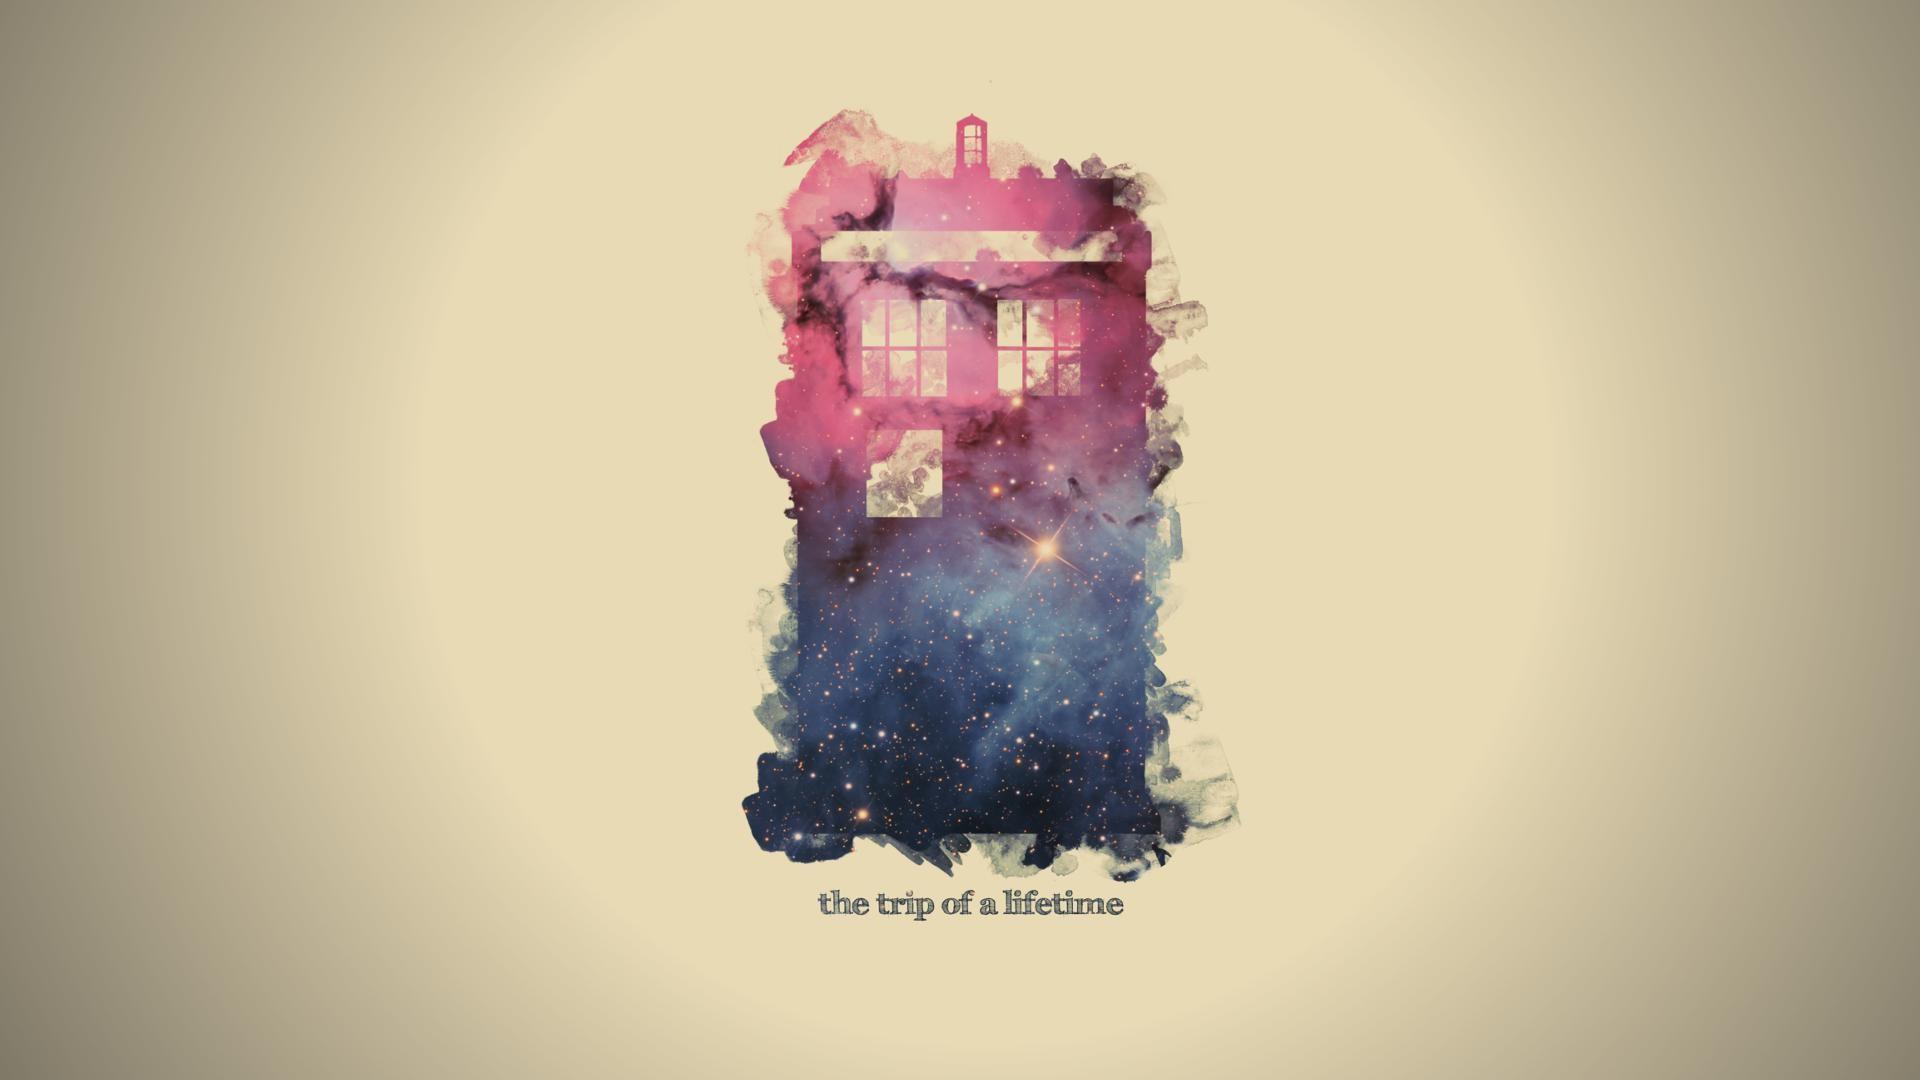 Doctor Who Tardis wallpaper 193543